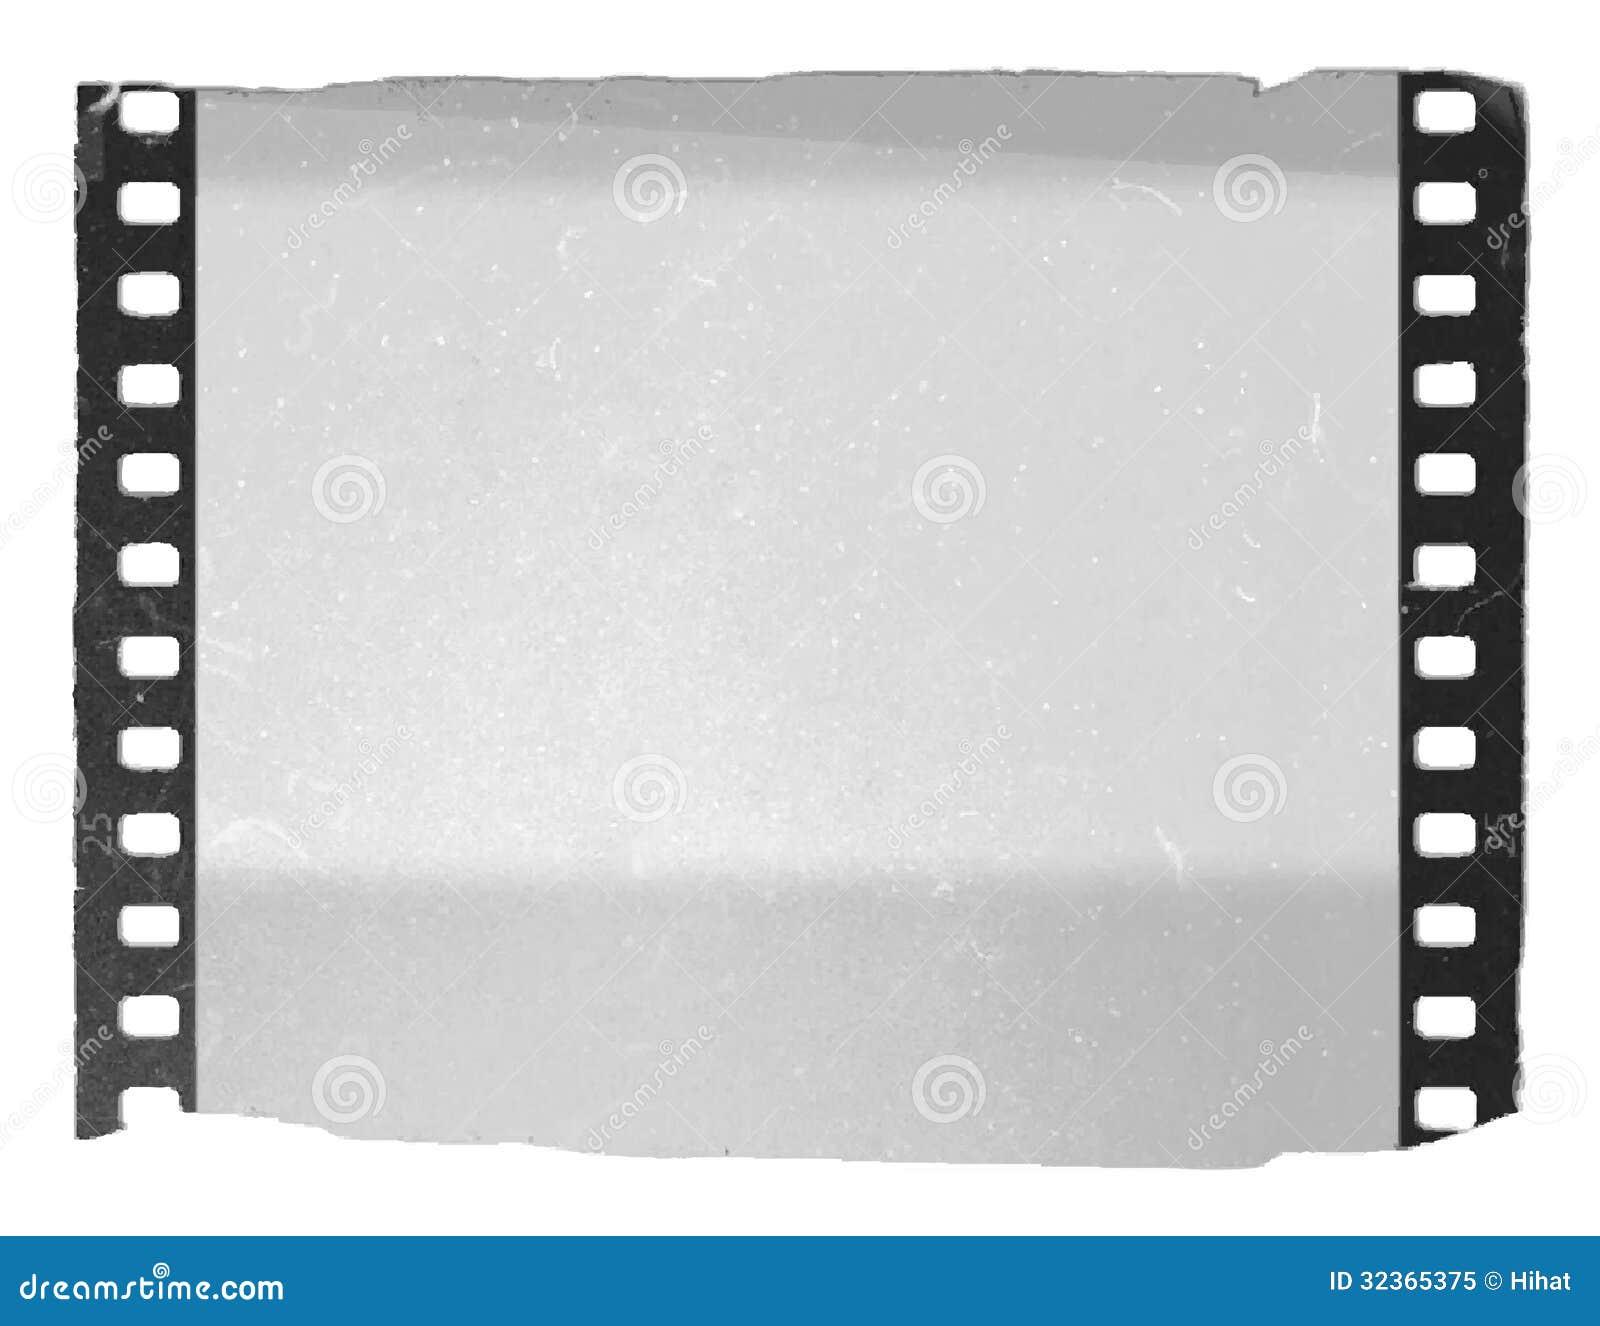 Film Vector Background Stock Vector Illustration Of Blank 32365375